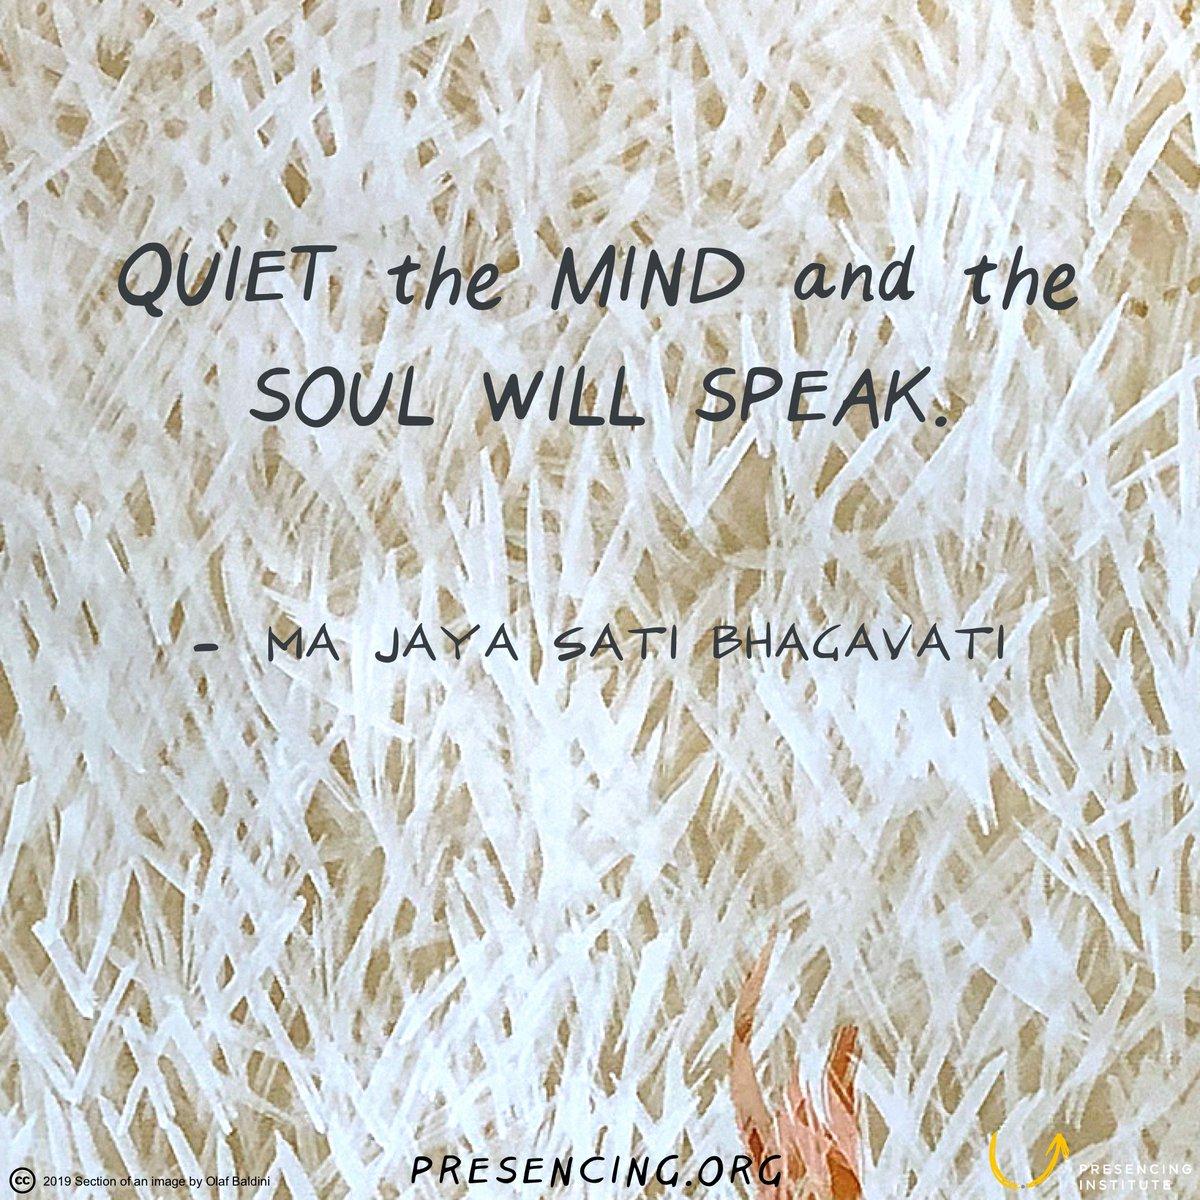 Quiet the mind and the soul will speak. #MaJayaSatiBhagavati bit.ly/35YD6j8 #payitforward @presencing_inst Drawing: Olaf Baldini